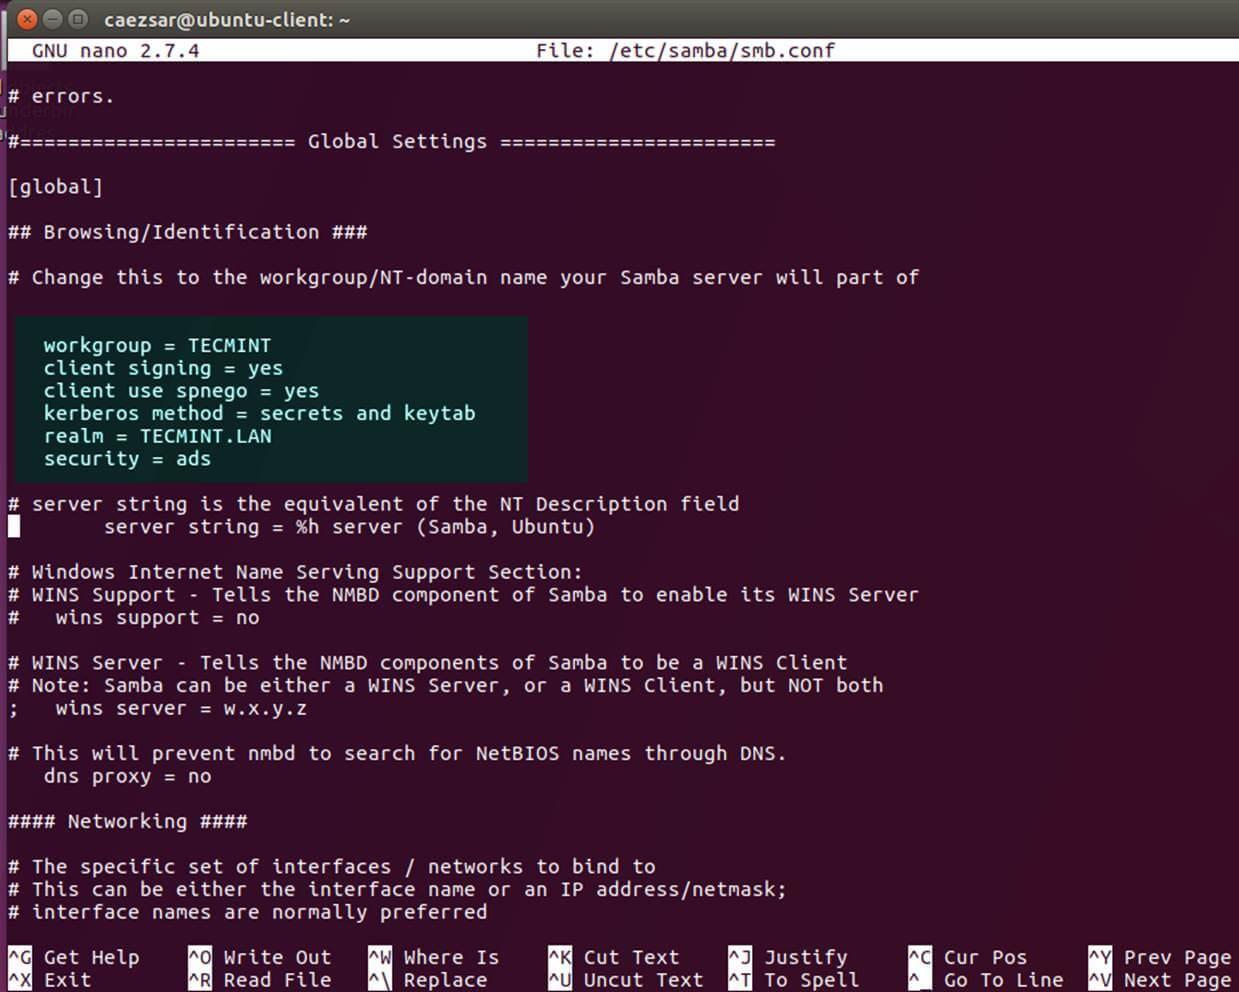 配置 Samba 服务器